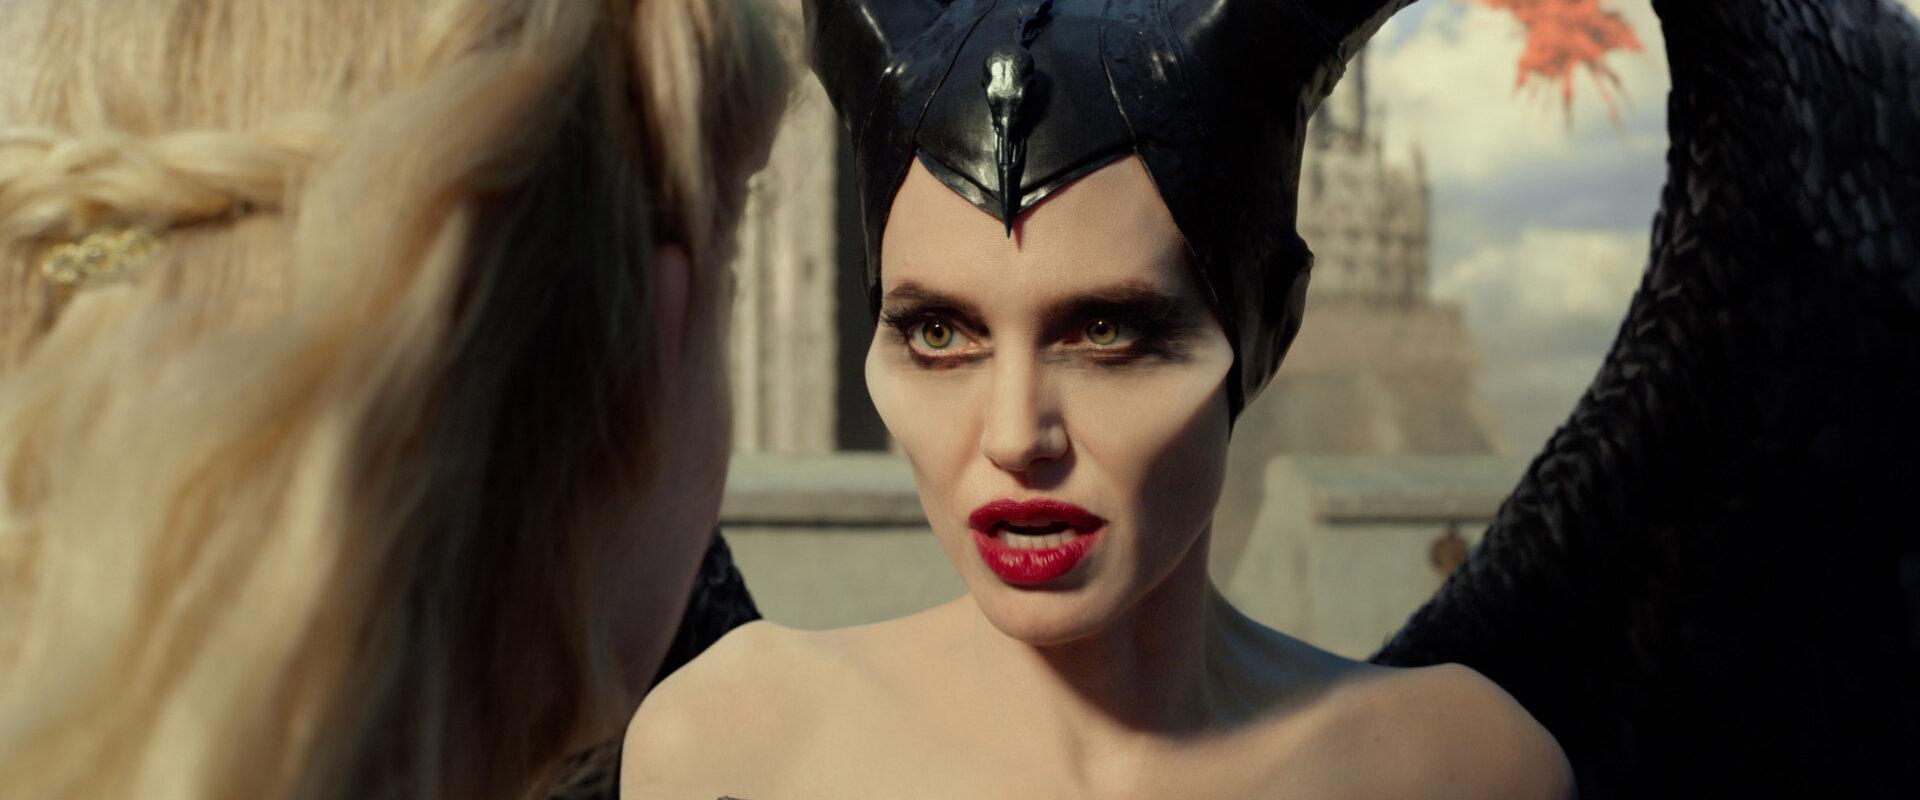 Maleficent Mistress Of Evil More Half Baked Marvel Esque